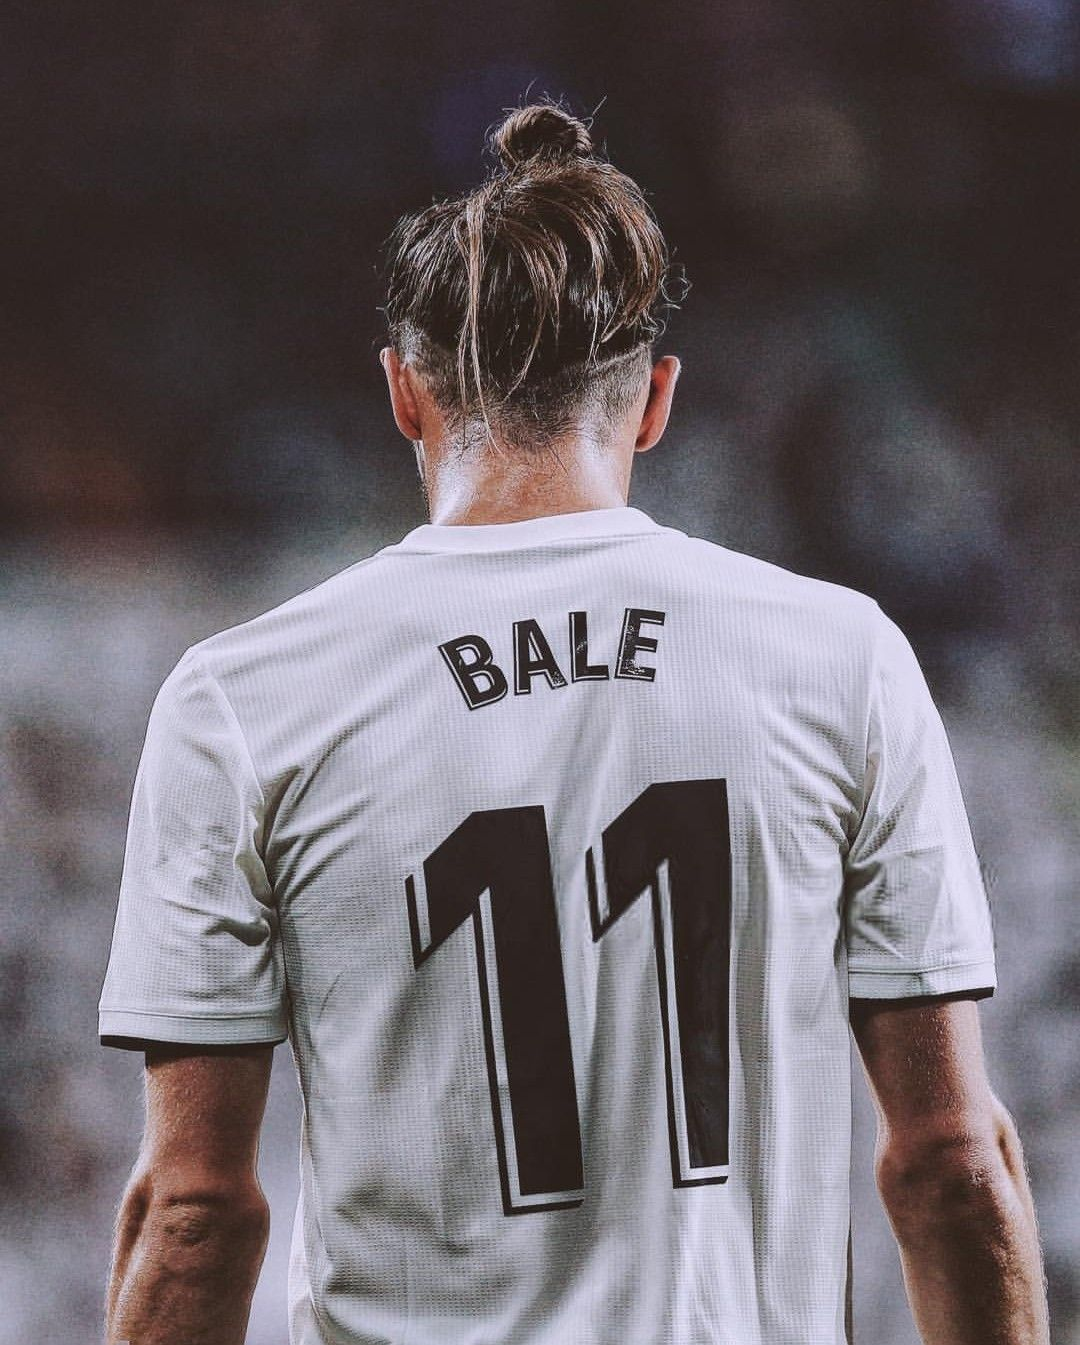 G Bale Real Madrid Gareth Bale Gareth Bale Manchester United Chelsea